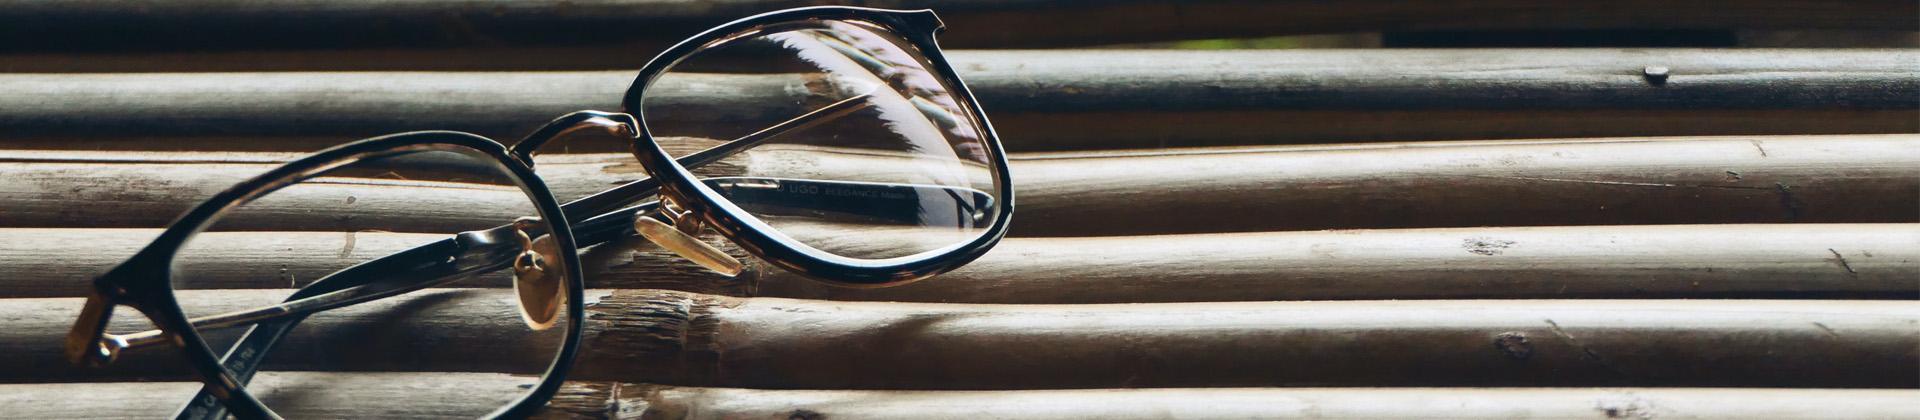 5 Biggest Benefits of Blue Light Glasses